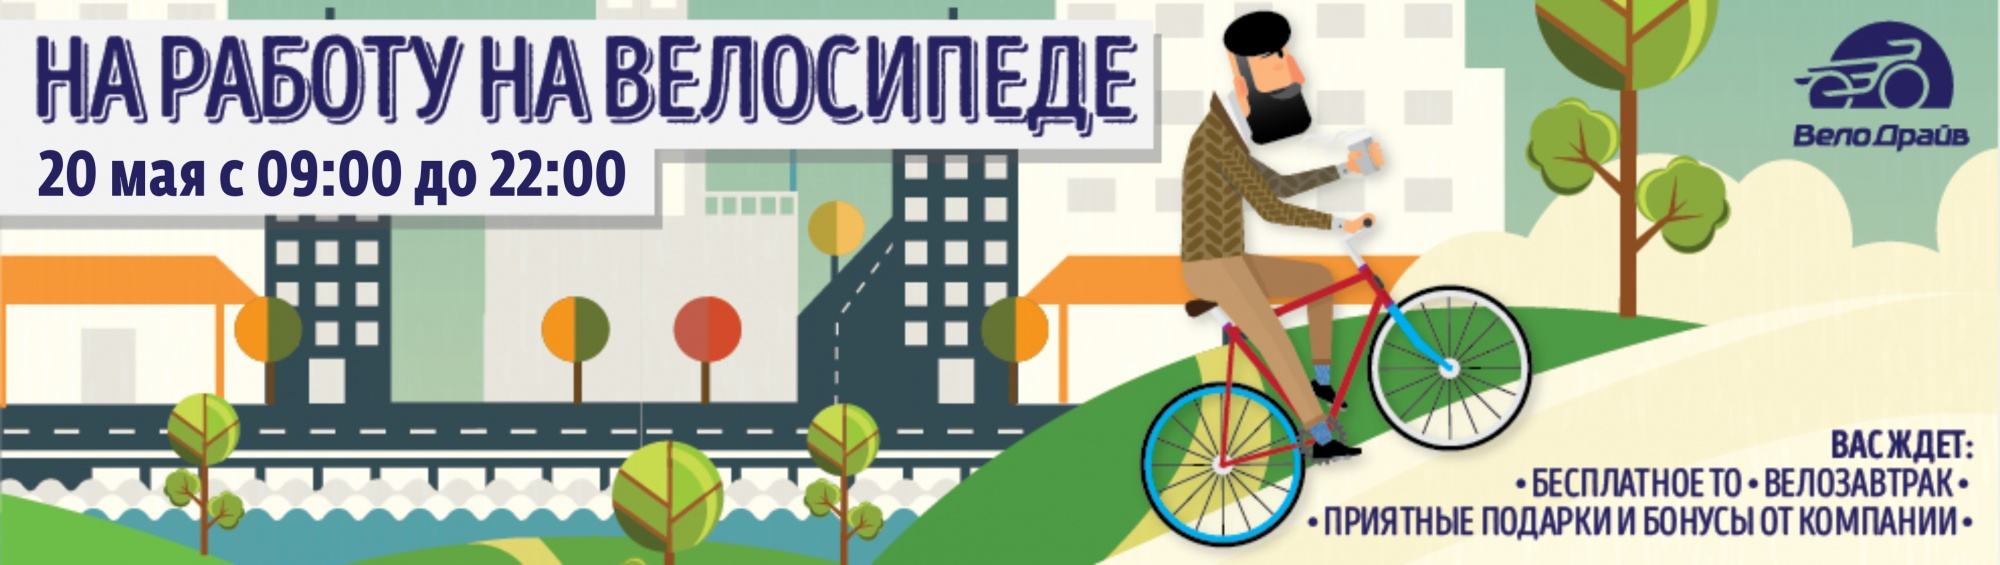 work_bike_banner-02.jpg